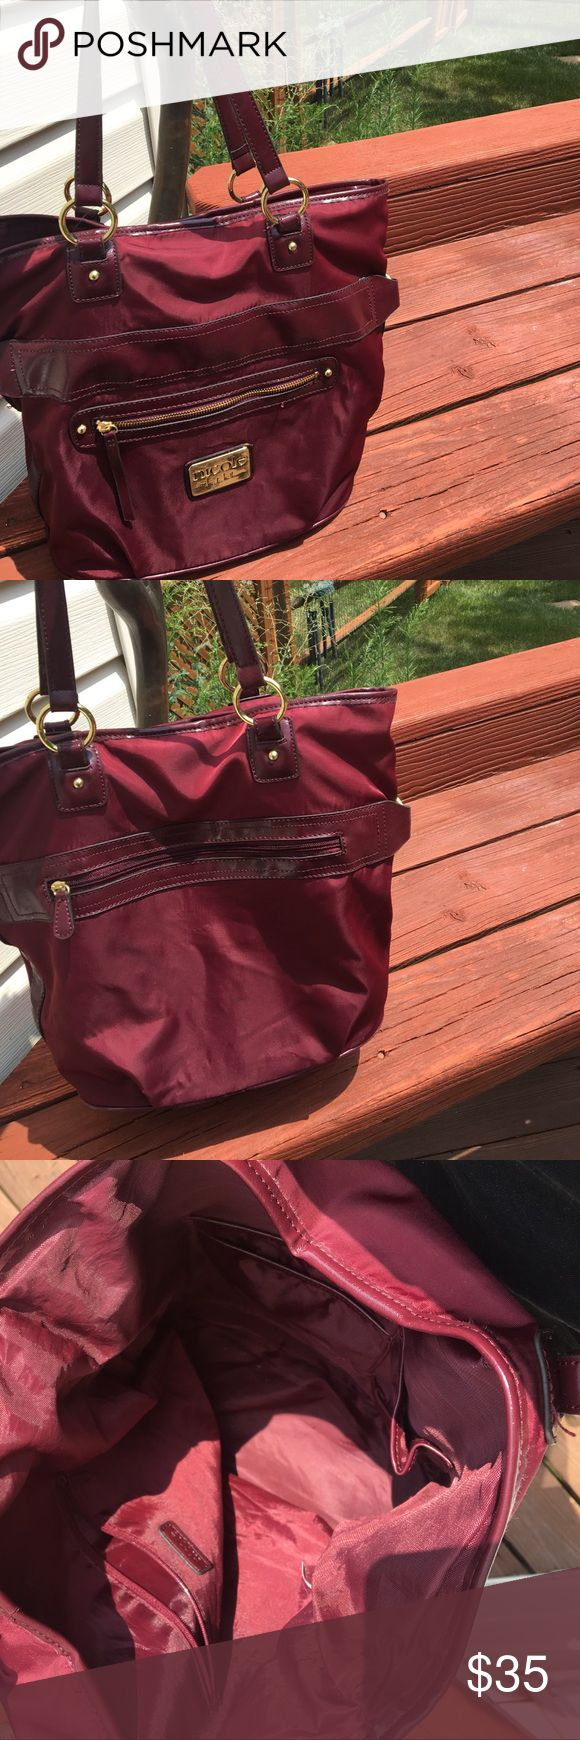 Nicole Miller Maroon shoulder bag Very stylish maroon purple shoulder purse Nicole by Nicole Miller Bags Shoulder Bags